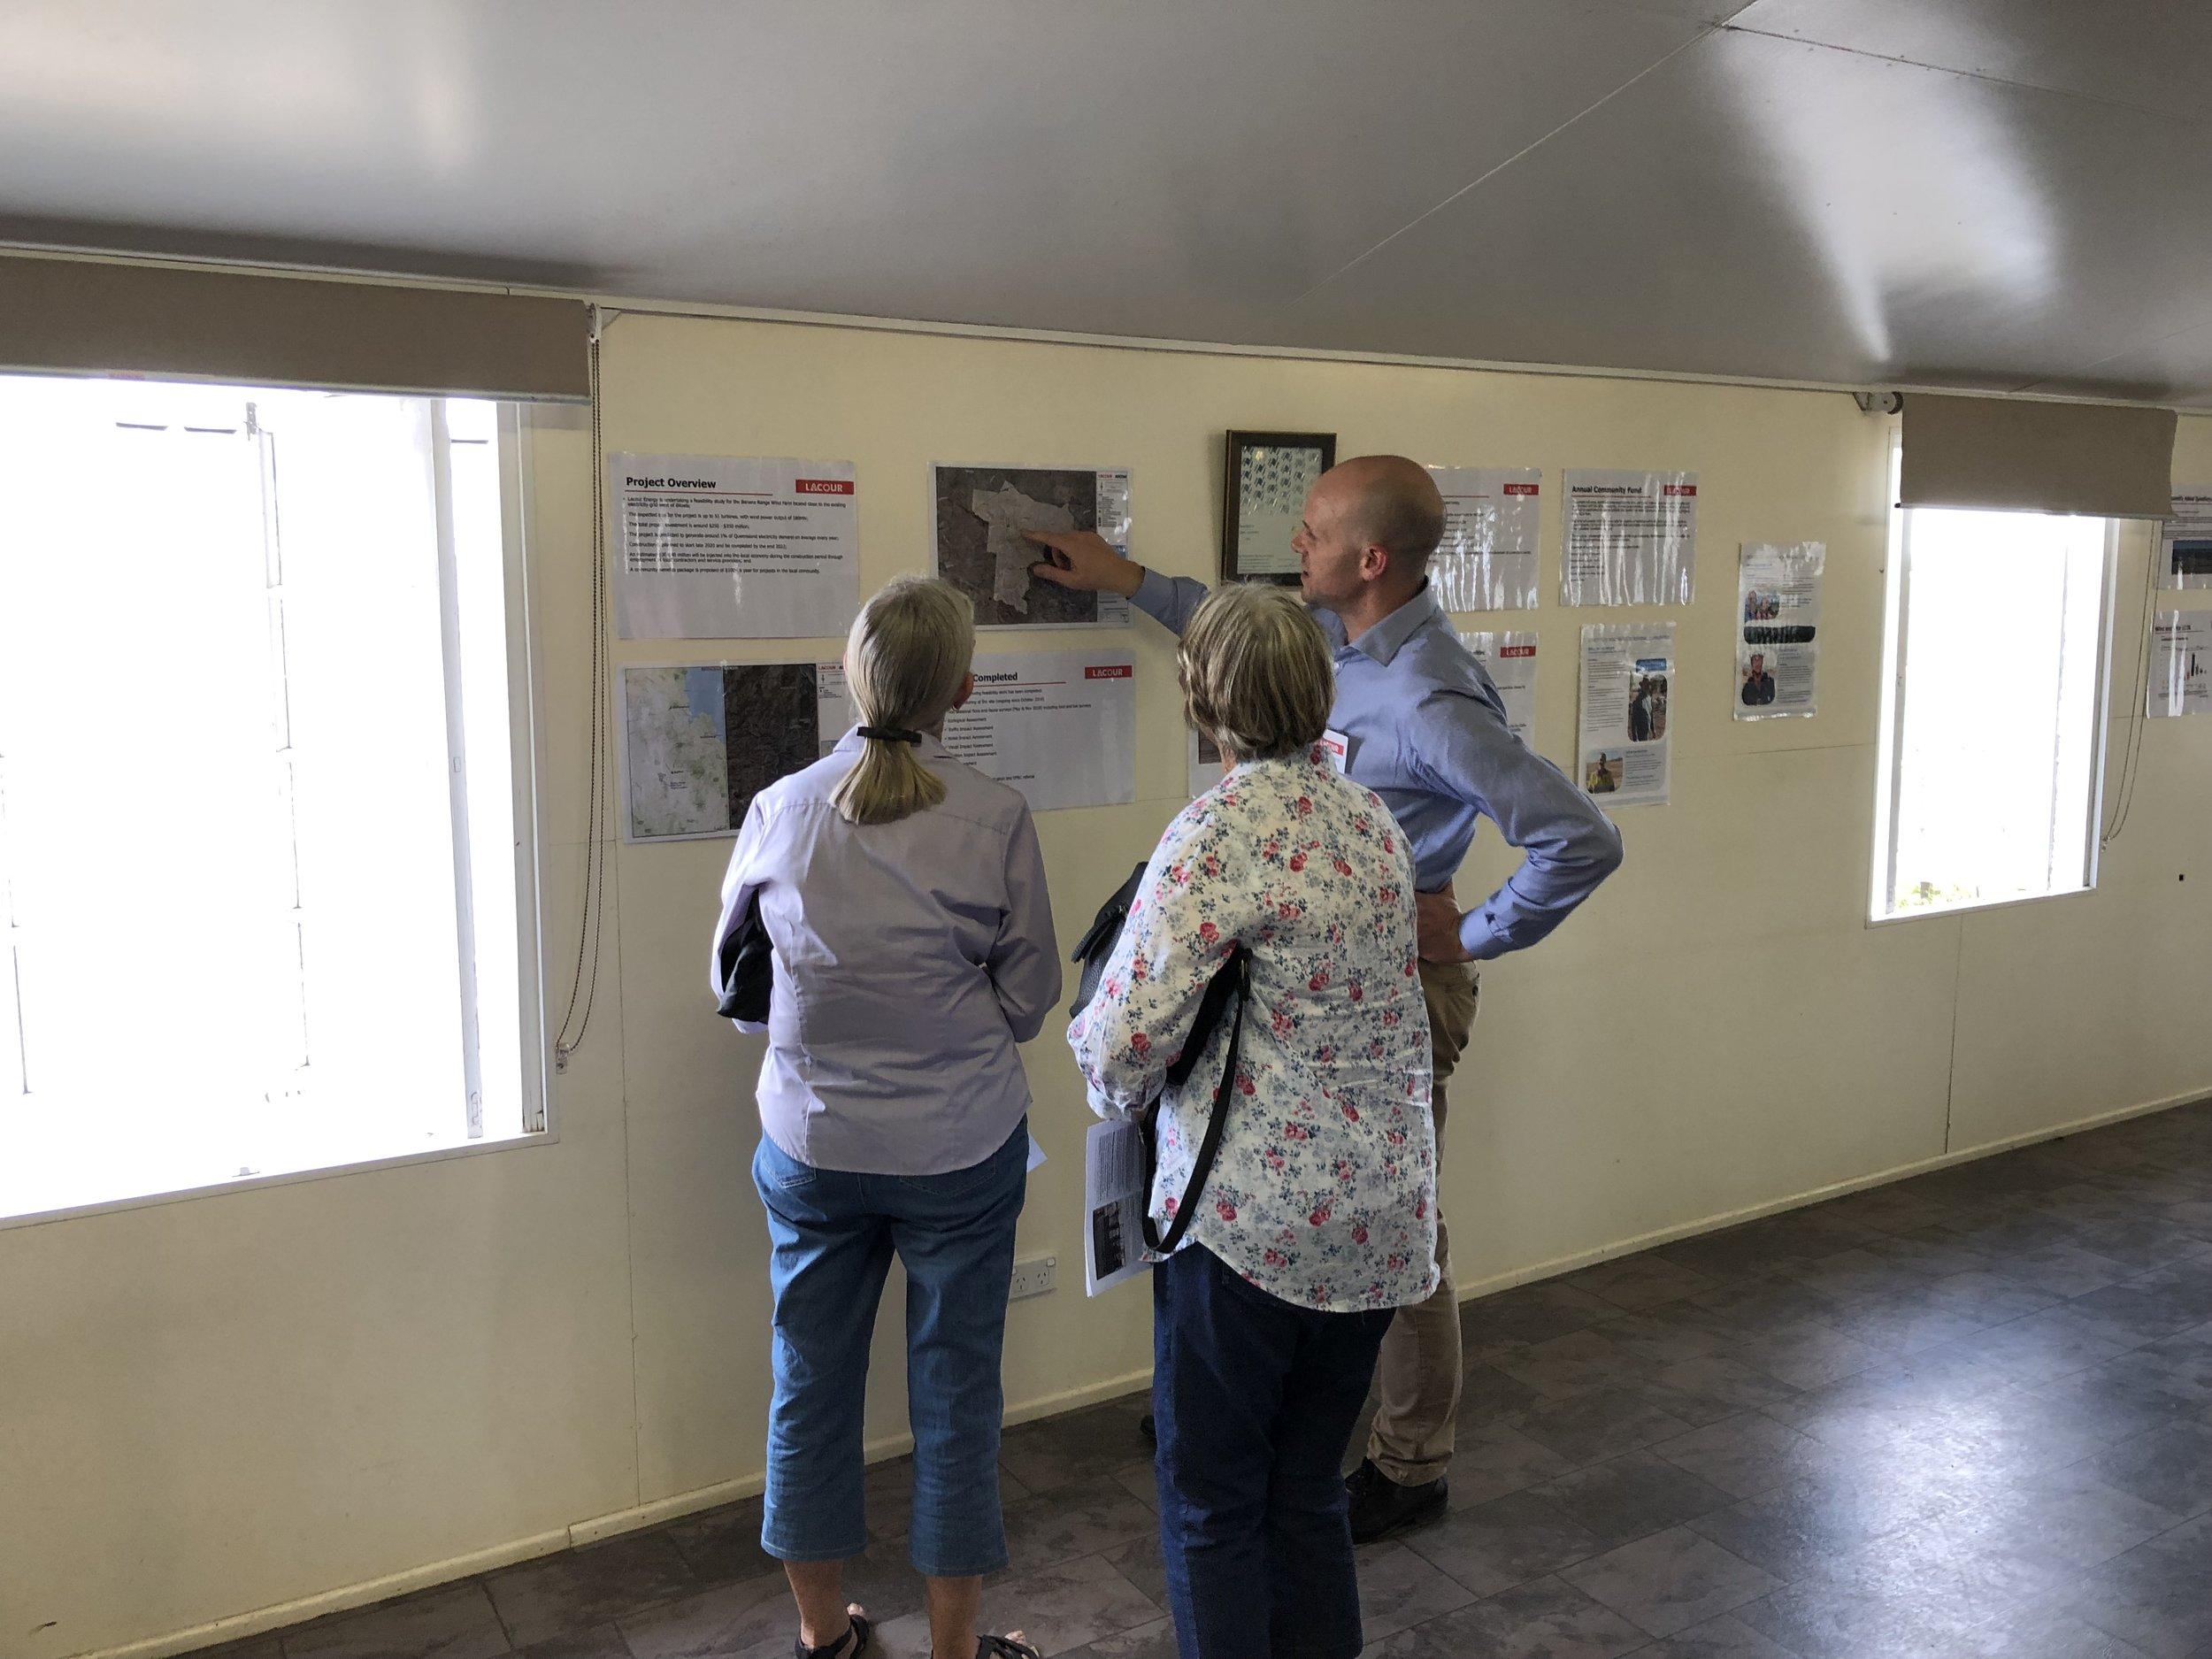 Exhibition Sutherland Hall, 25 September 2019